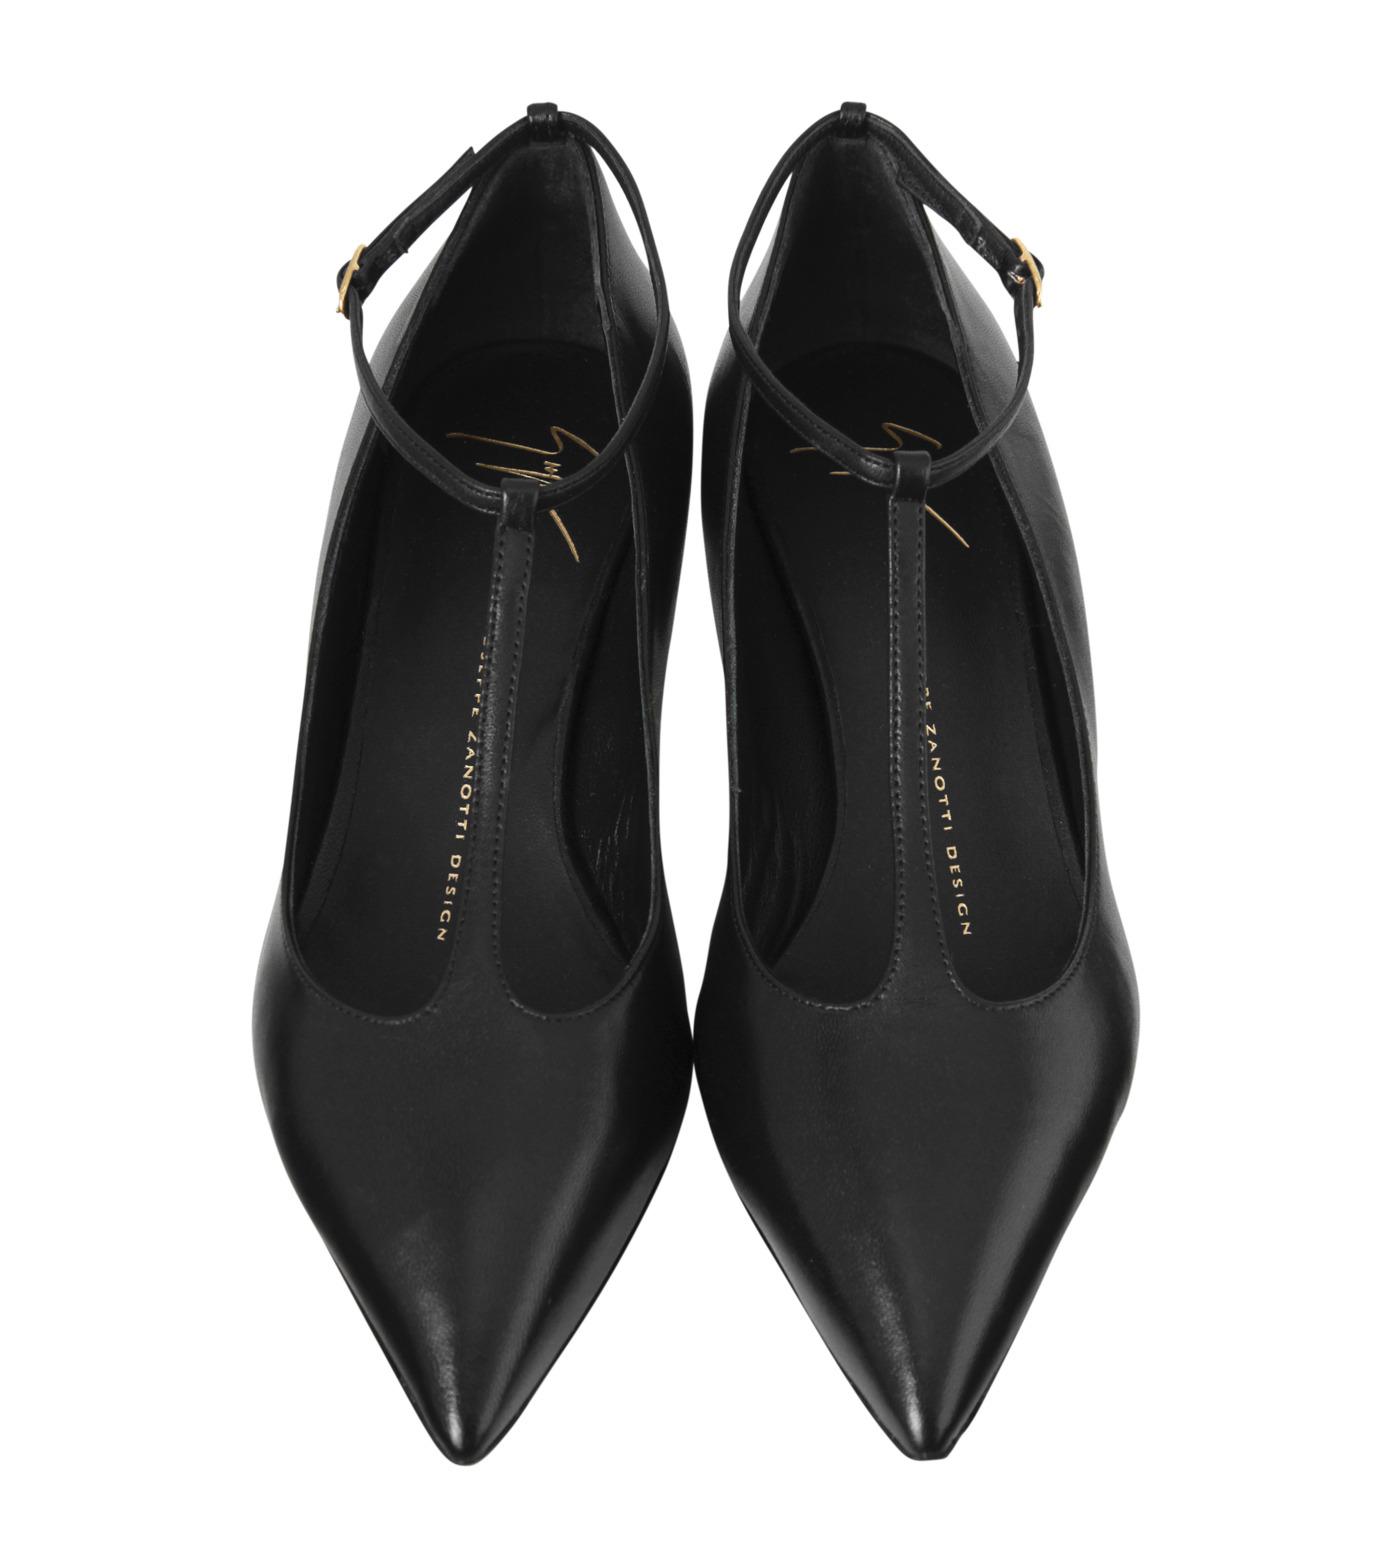 Giuseppe Zanotti Design(ジュゼッペザノッティ)のKitten Heel T-Strap Pump-BLACK(シューズ/shoes)-42-6082NP035-13 拡大詳細画像4